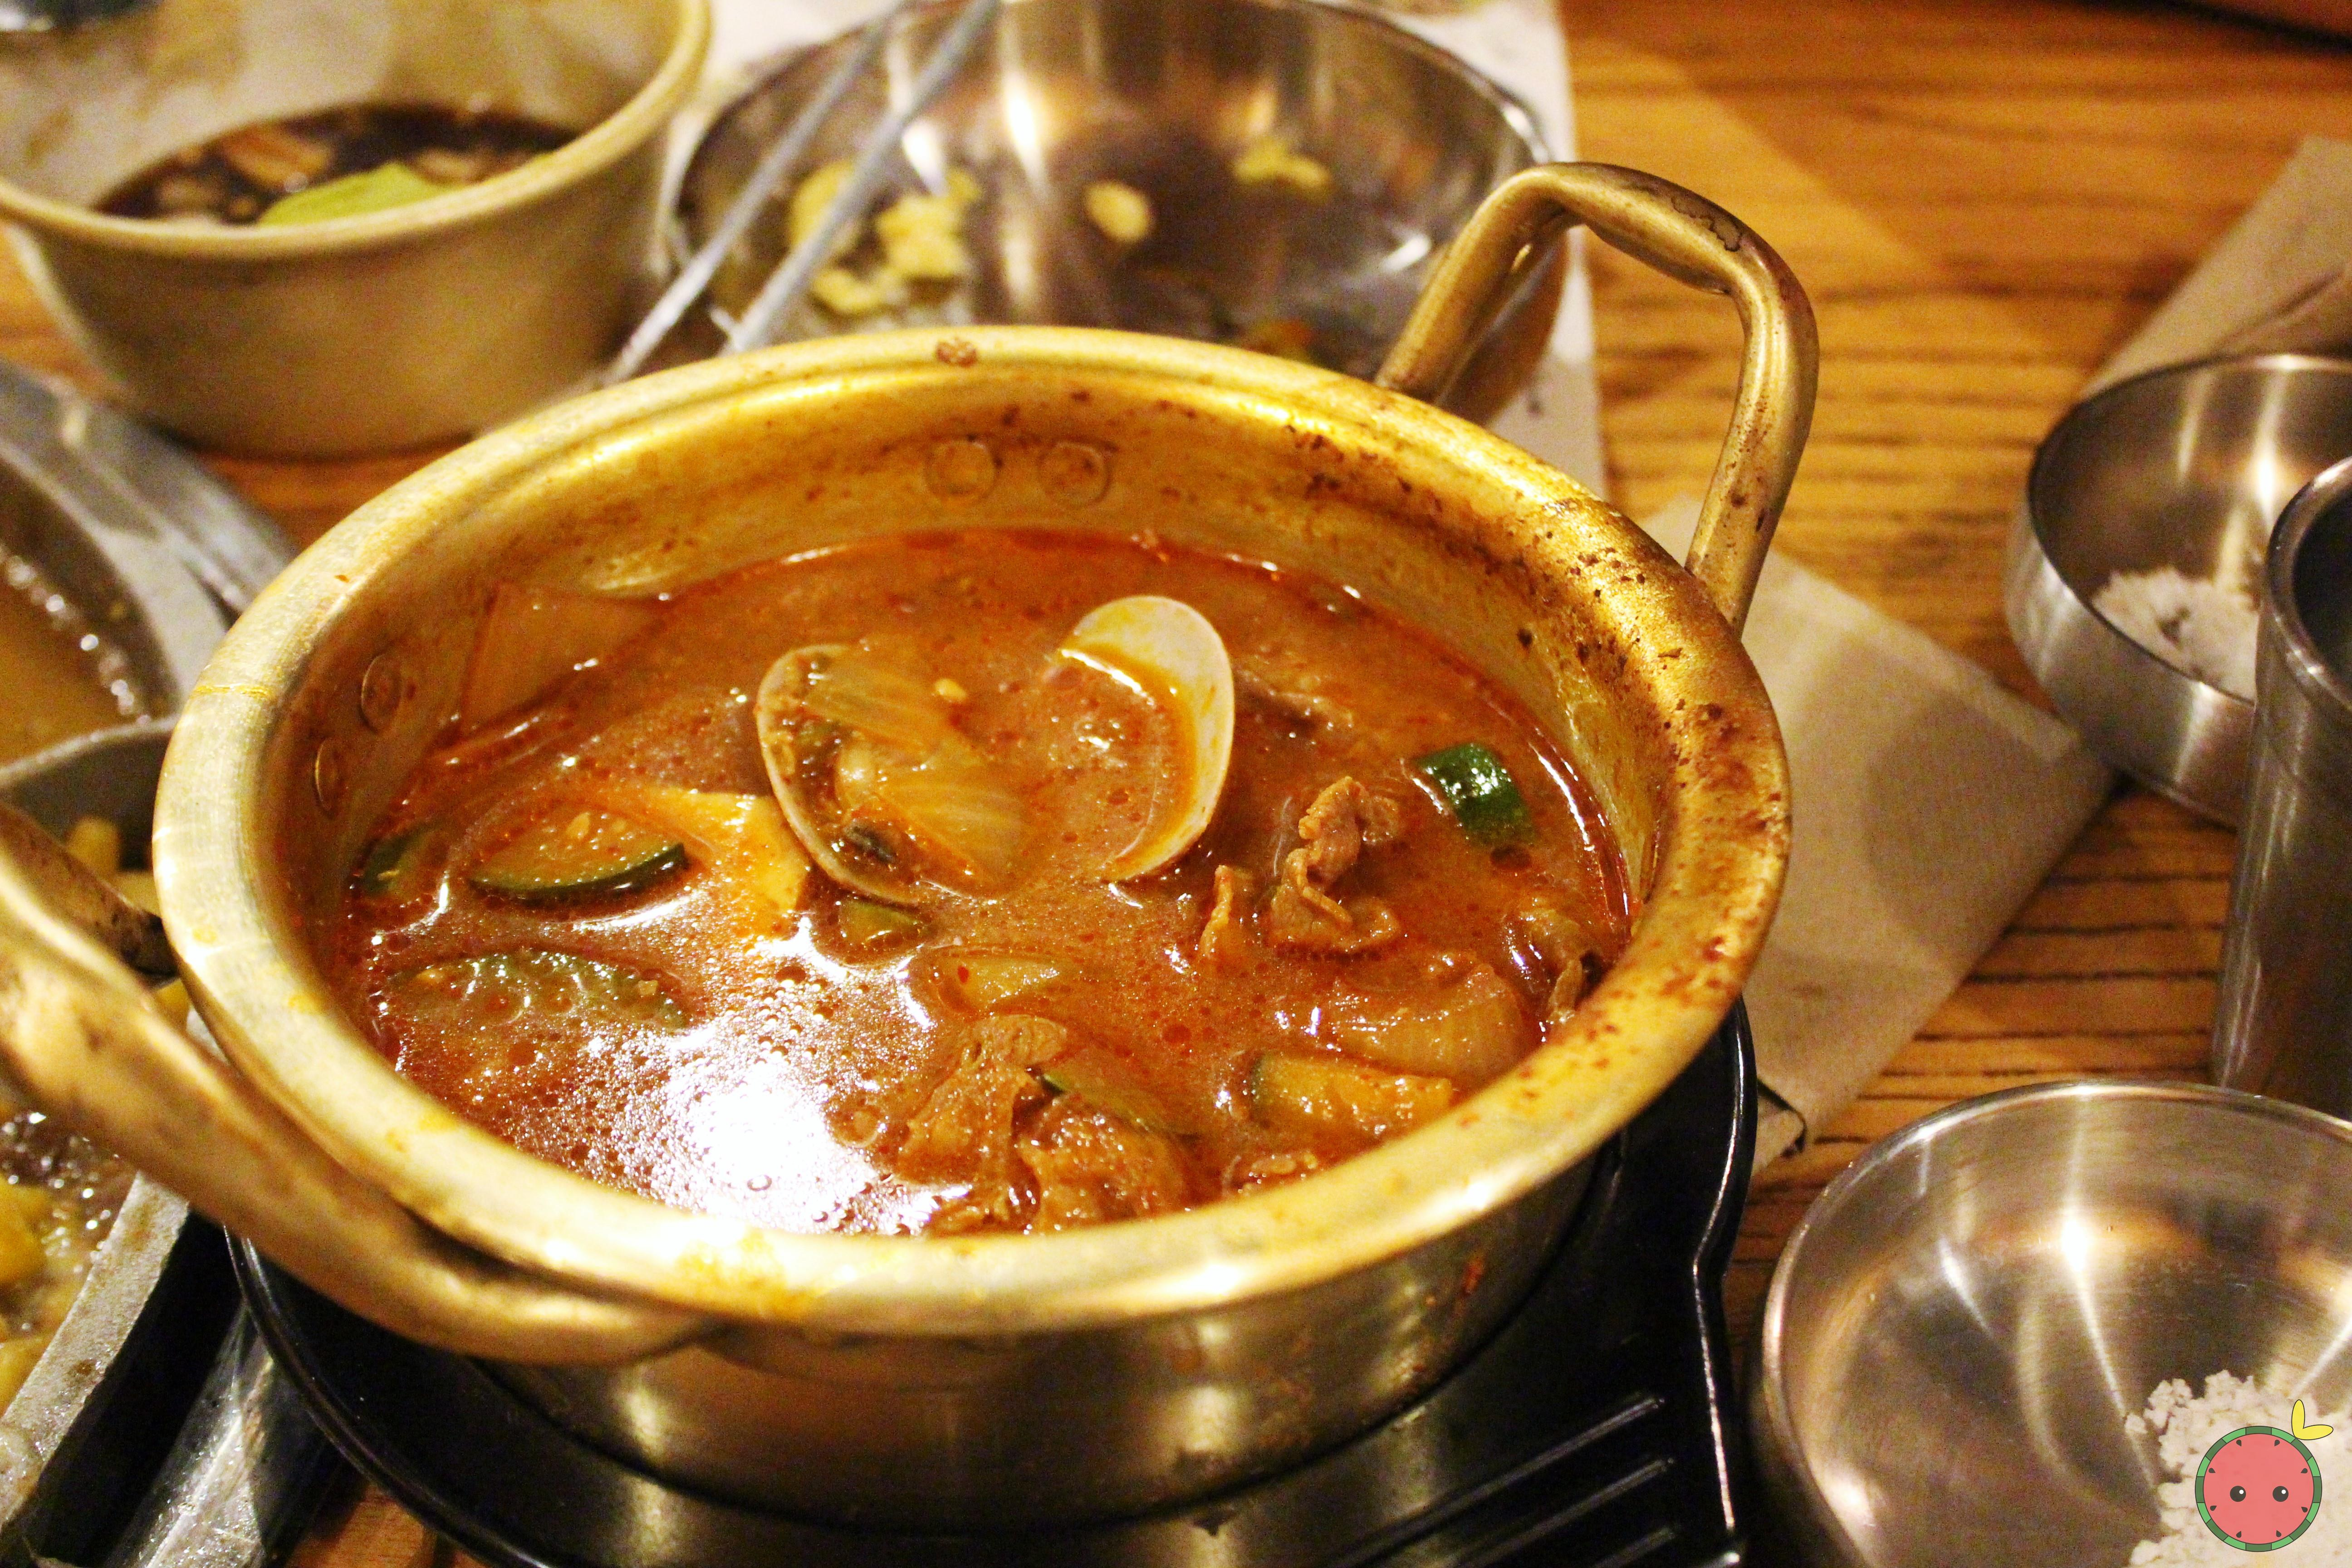 Bean paste stew